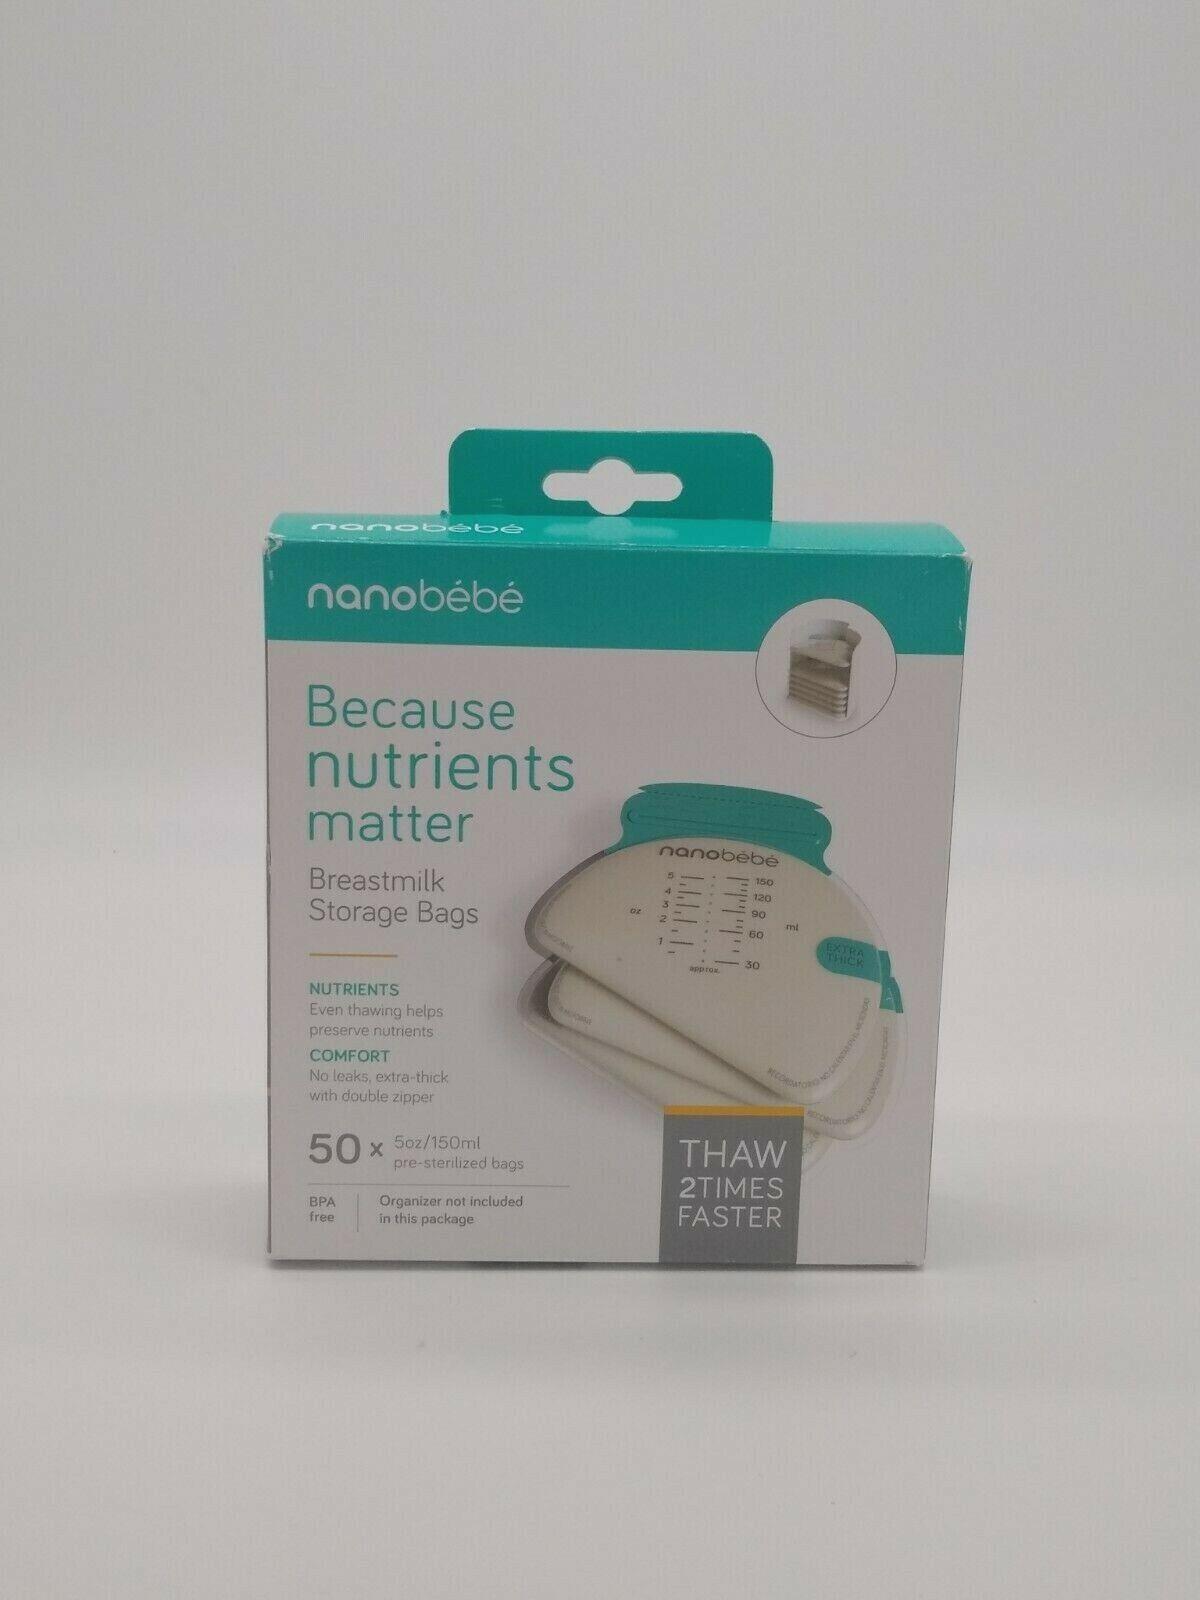 Nanobebe Breastmilk Storage Bags 50 Pre Sterilized Bags 5 Oz 150 Ml Each - $12.00